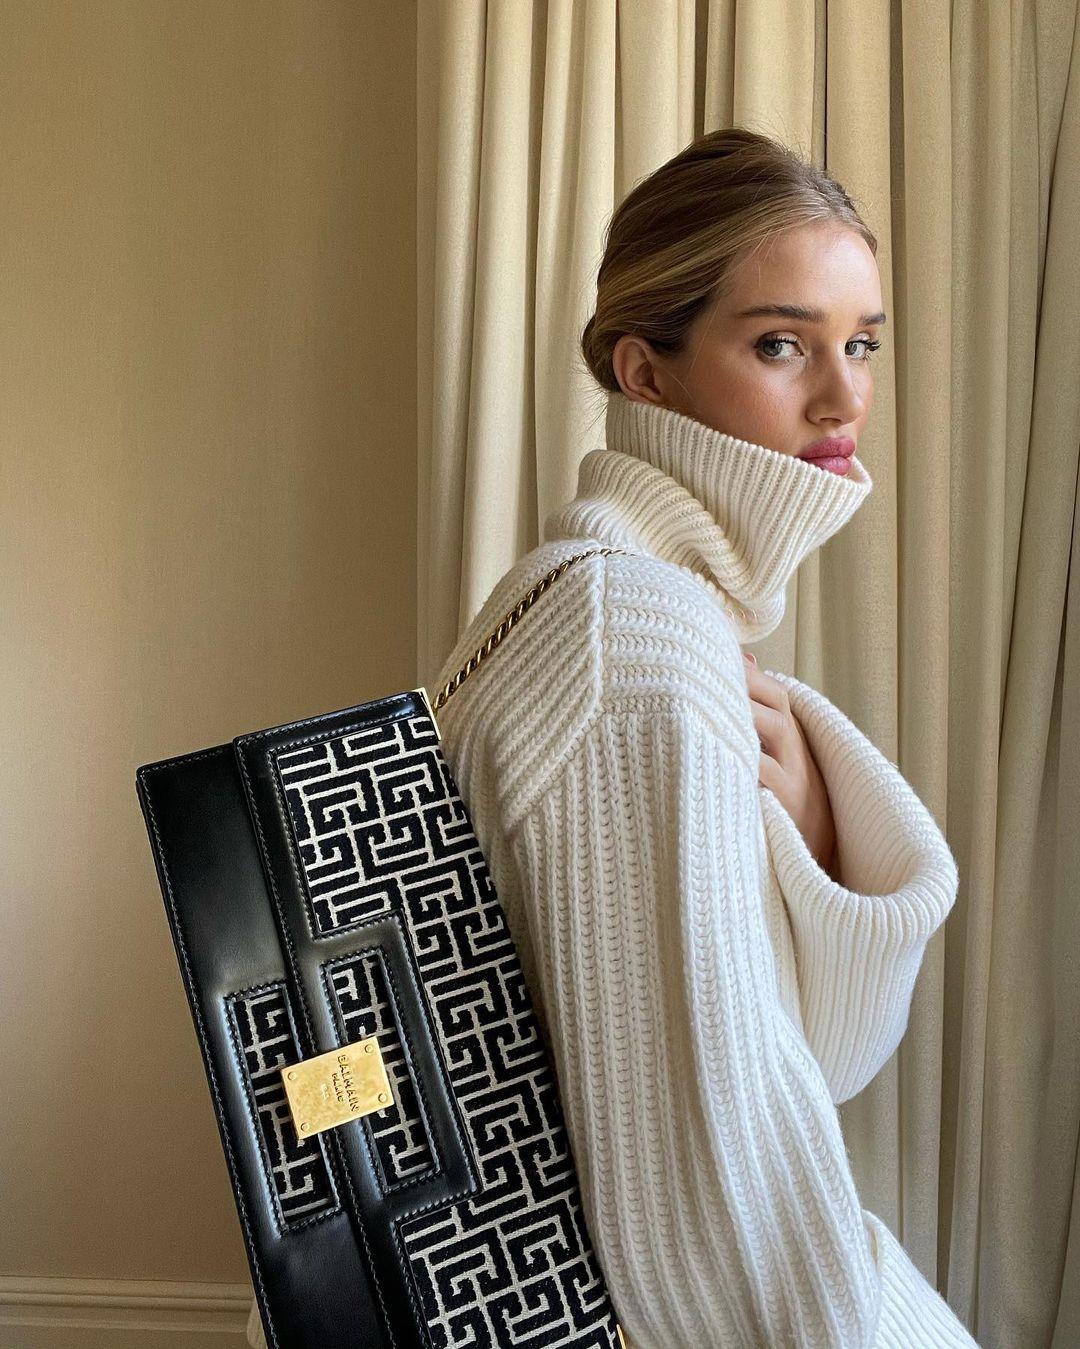 How To Recreate Rosie Huntington-Whiteley's Model Style - Rosie Huntington-Whiteley Model